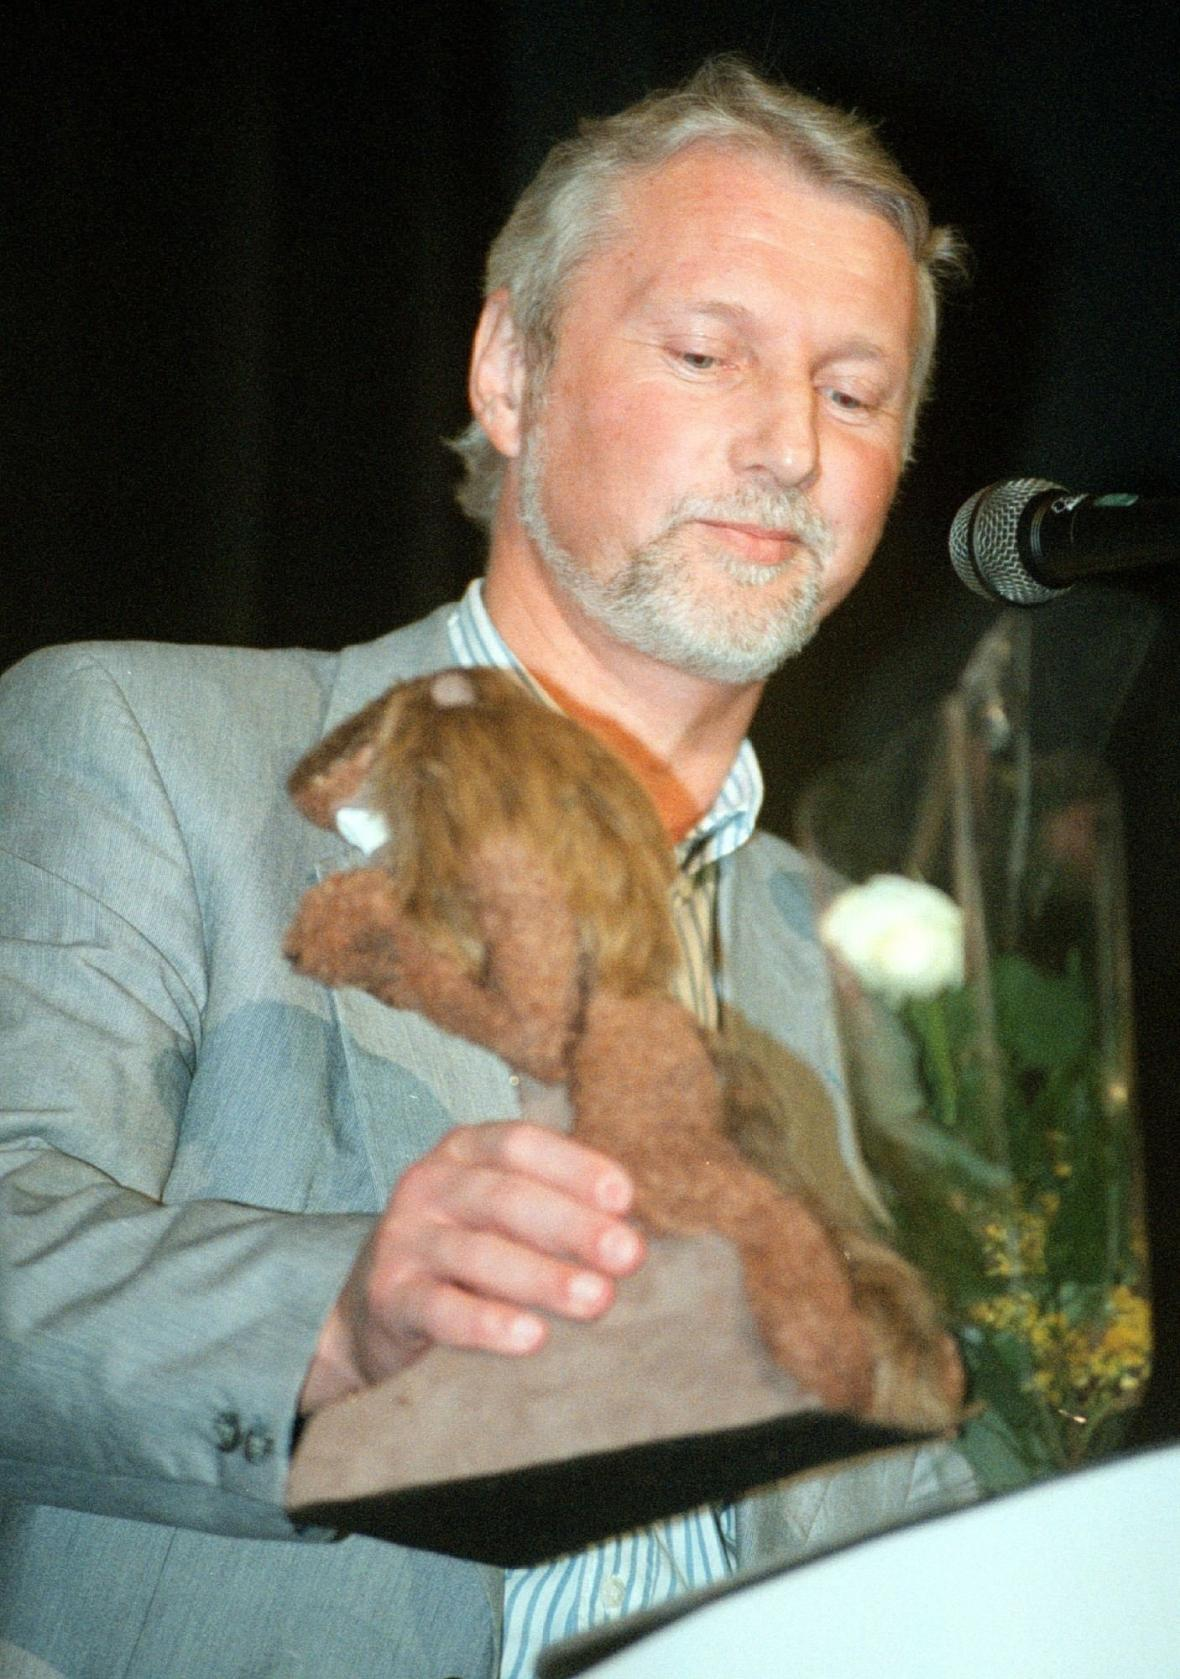 Ladislav Špaček přebírá anticenu Plyšový lev za svého syna Radima Špačka